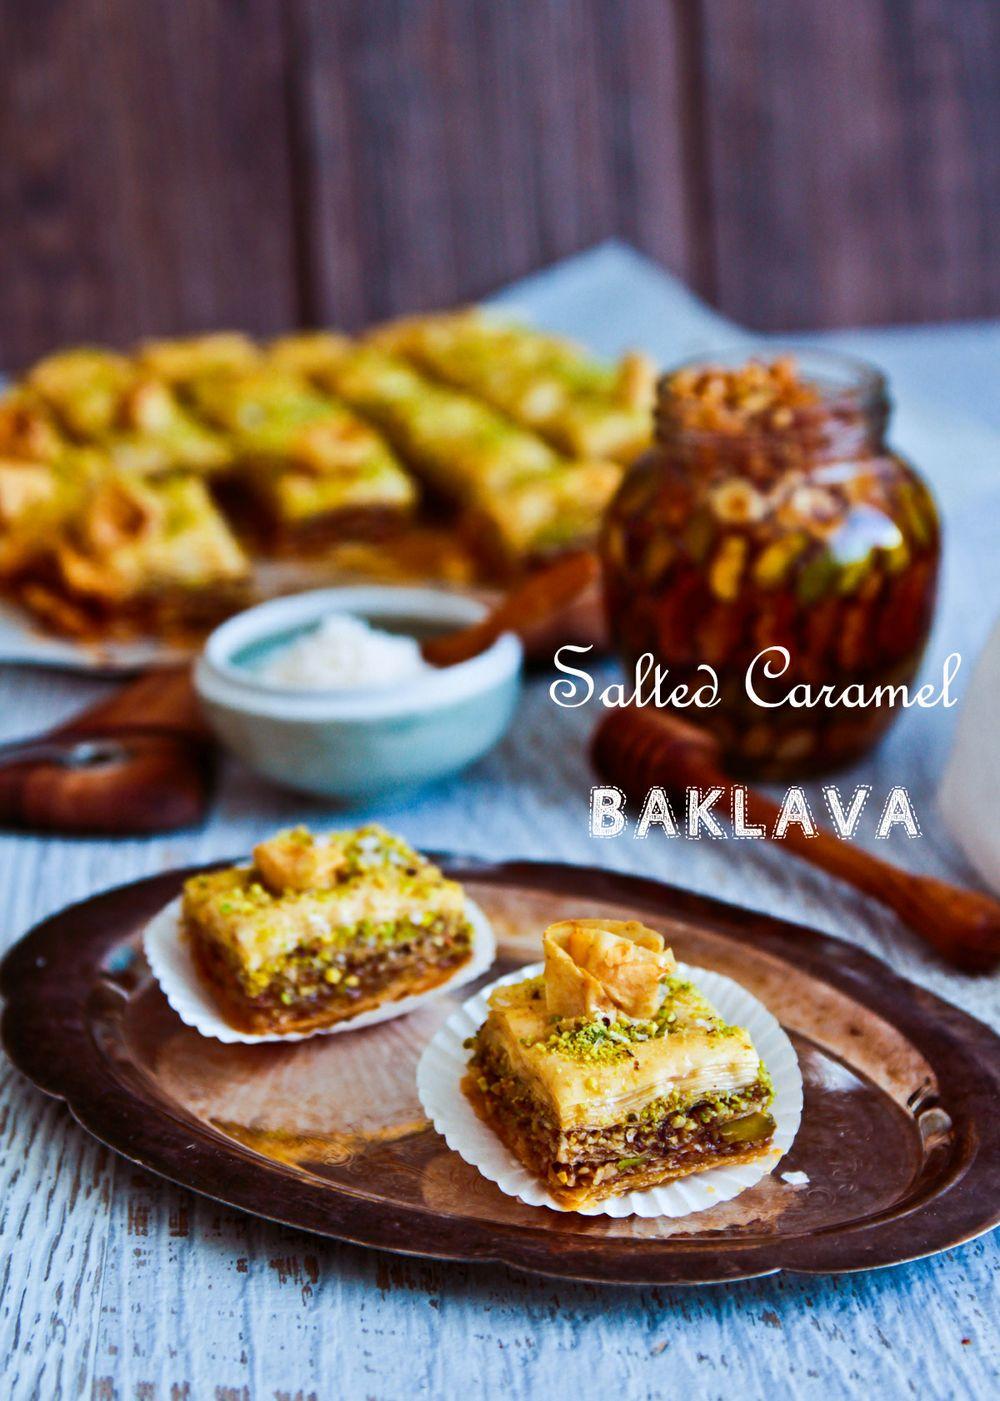 m-baklava-salted-caramel-1-